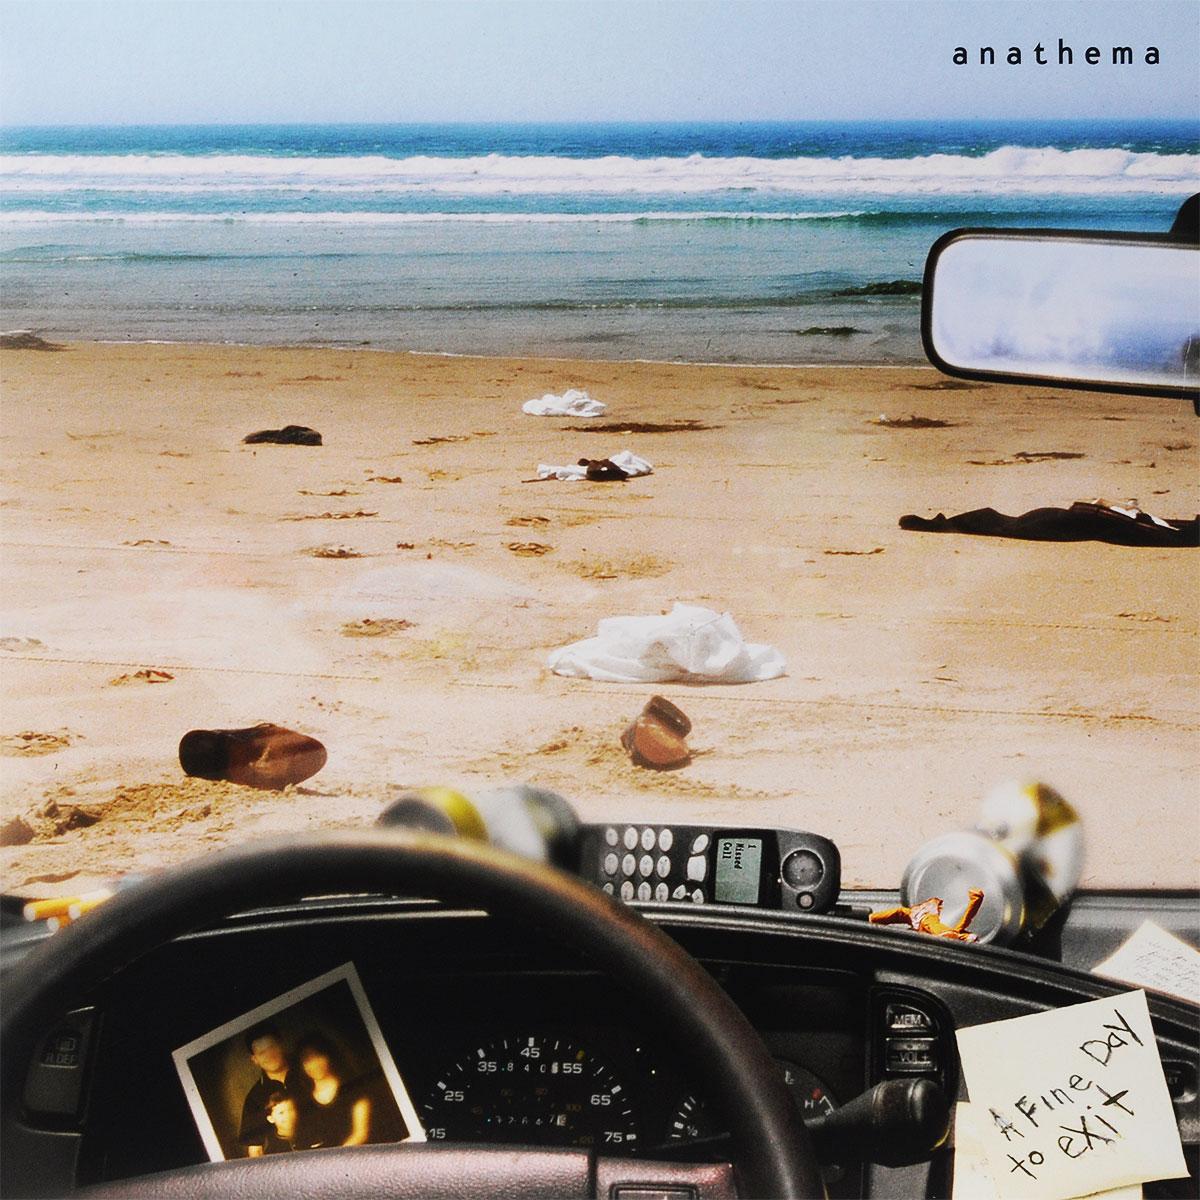 Anathema Anathema. A Fine Day To Exit (LP + CD) anathema anathema a fine day to exit lp cd